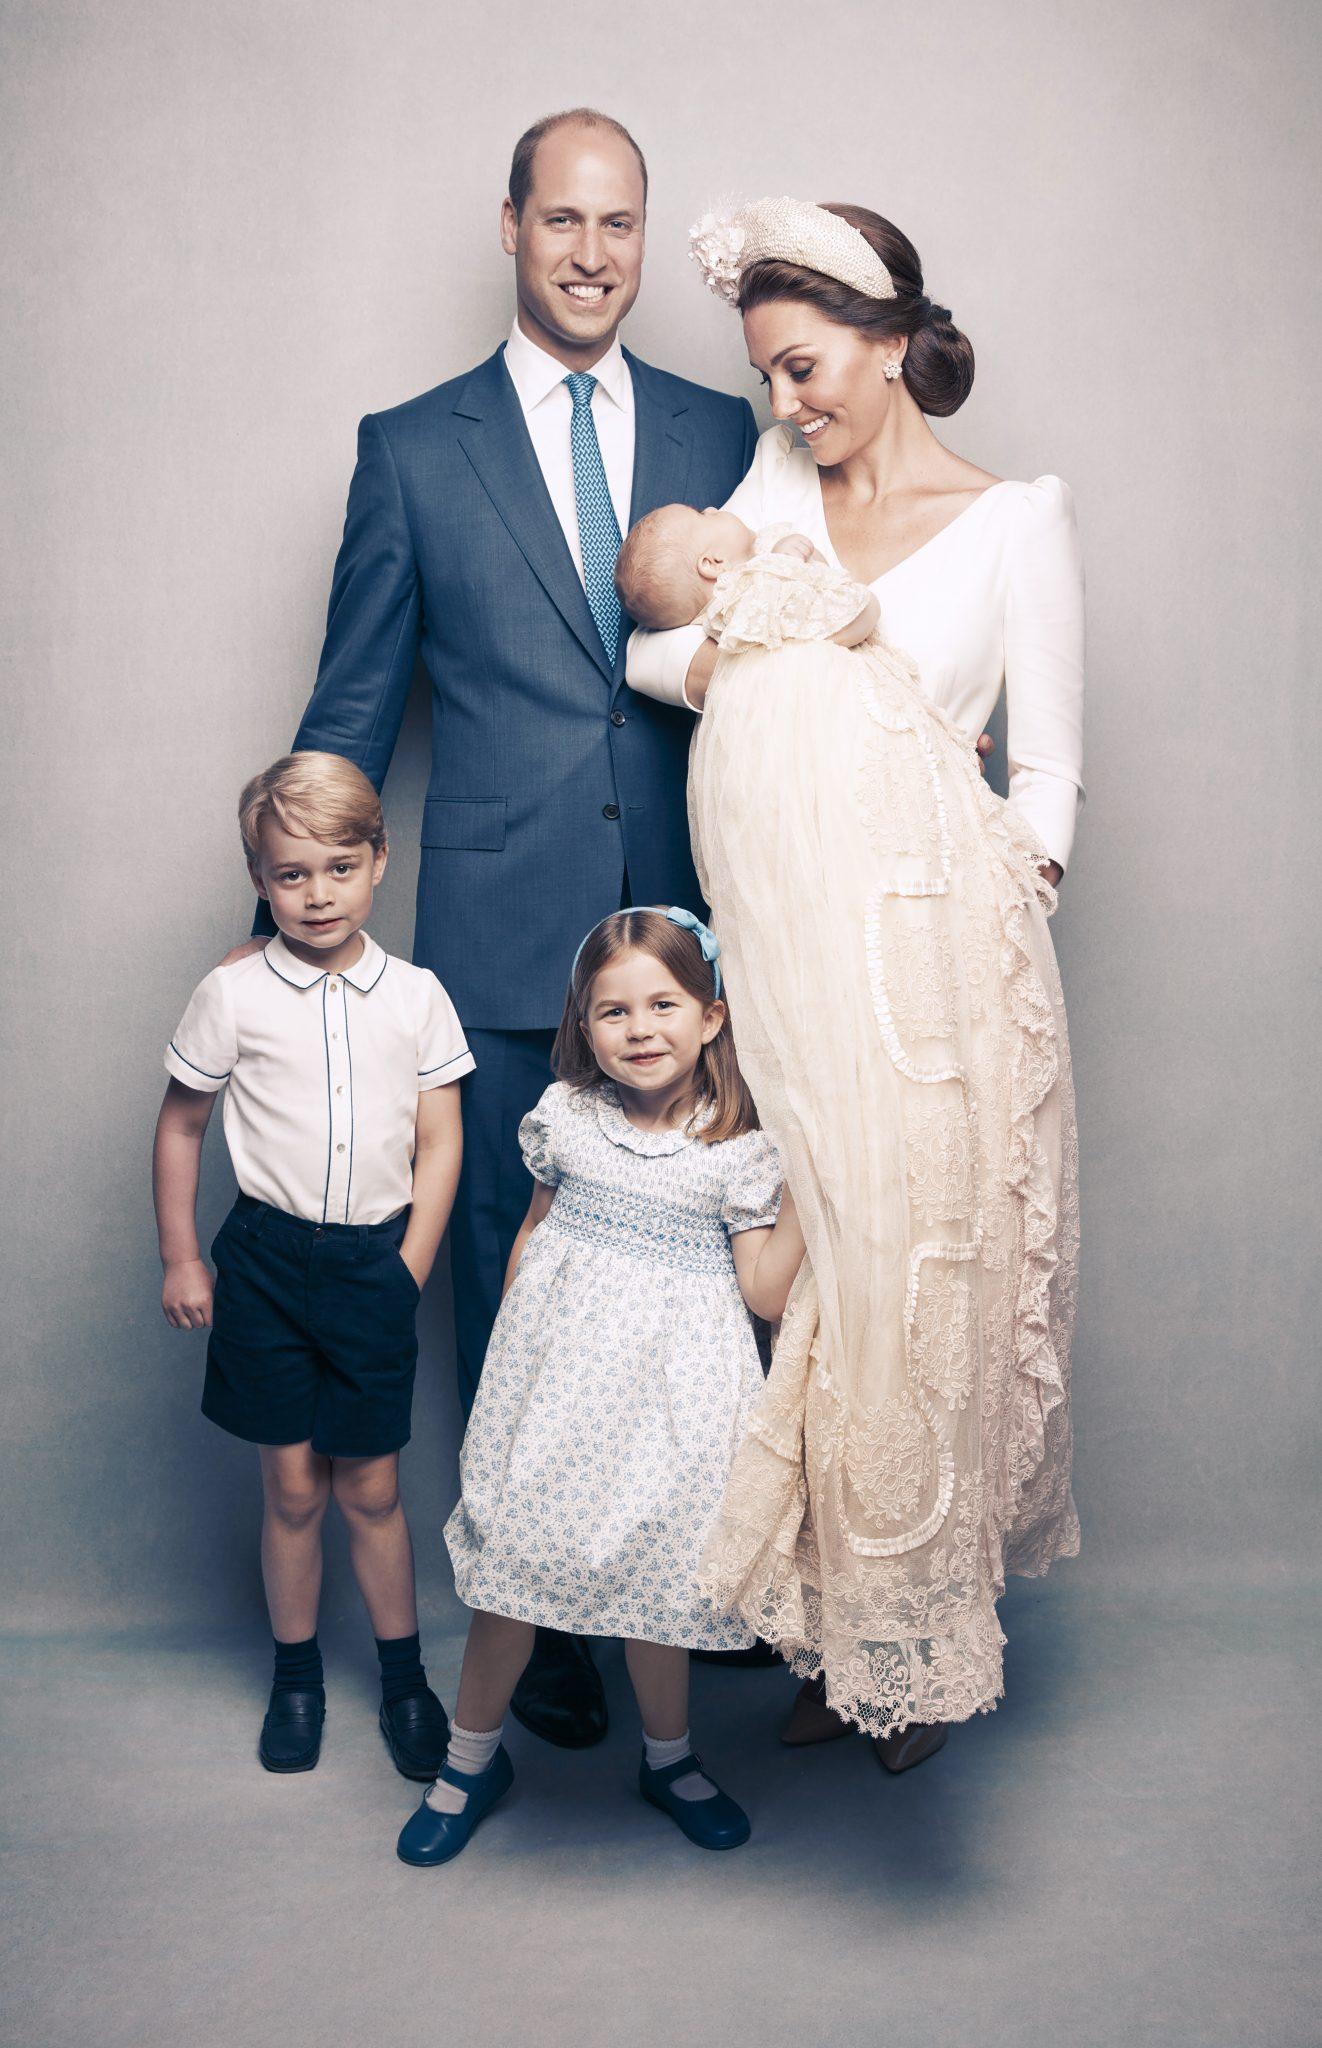 Saptamana cu emotii pentru ducesa Kate Middleton